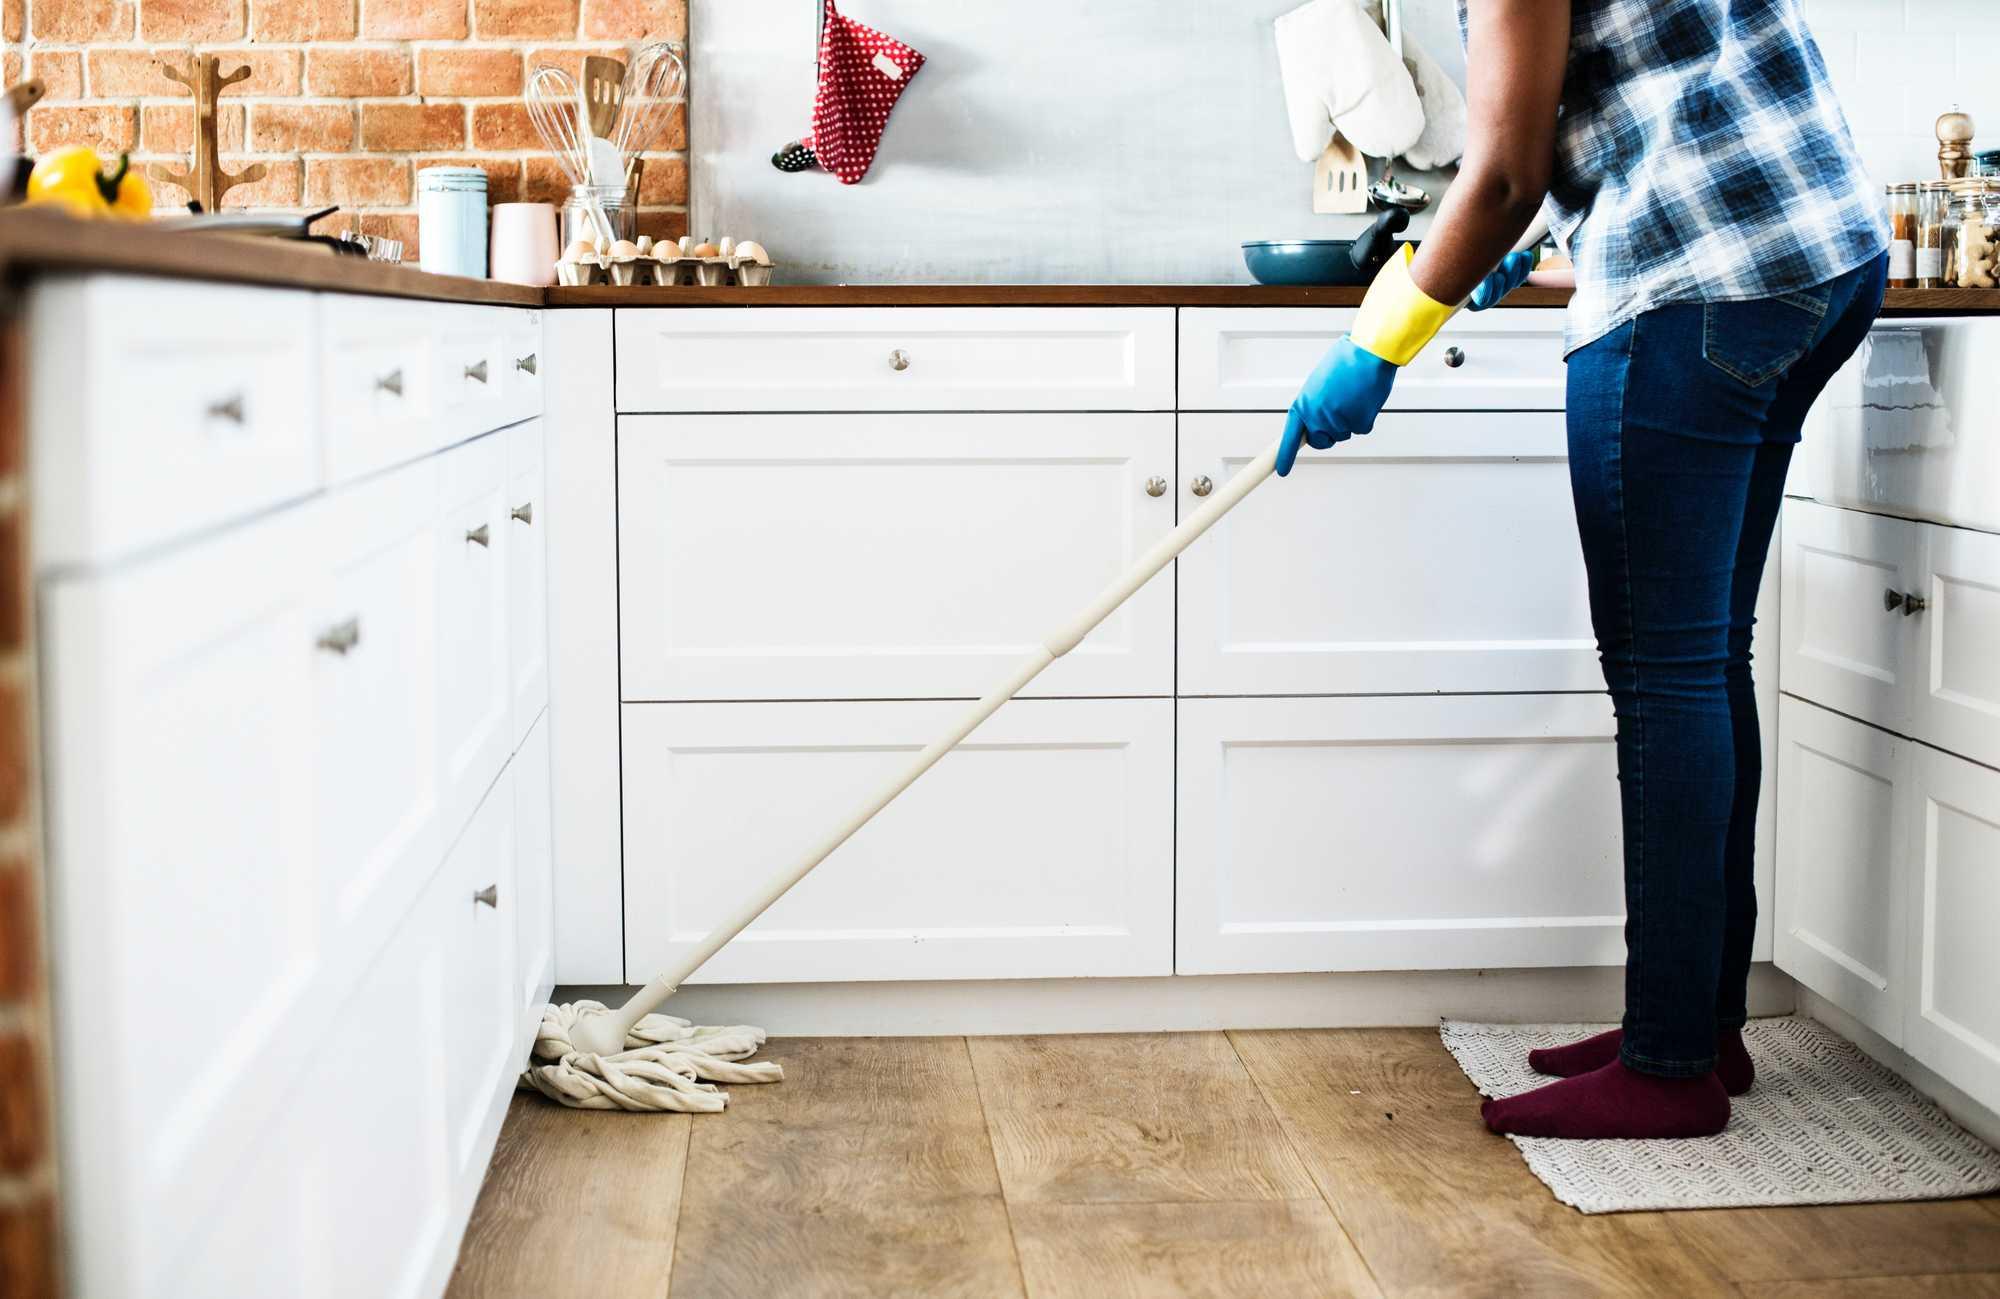 Manasquan Hospitality Cleaning